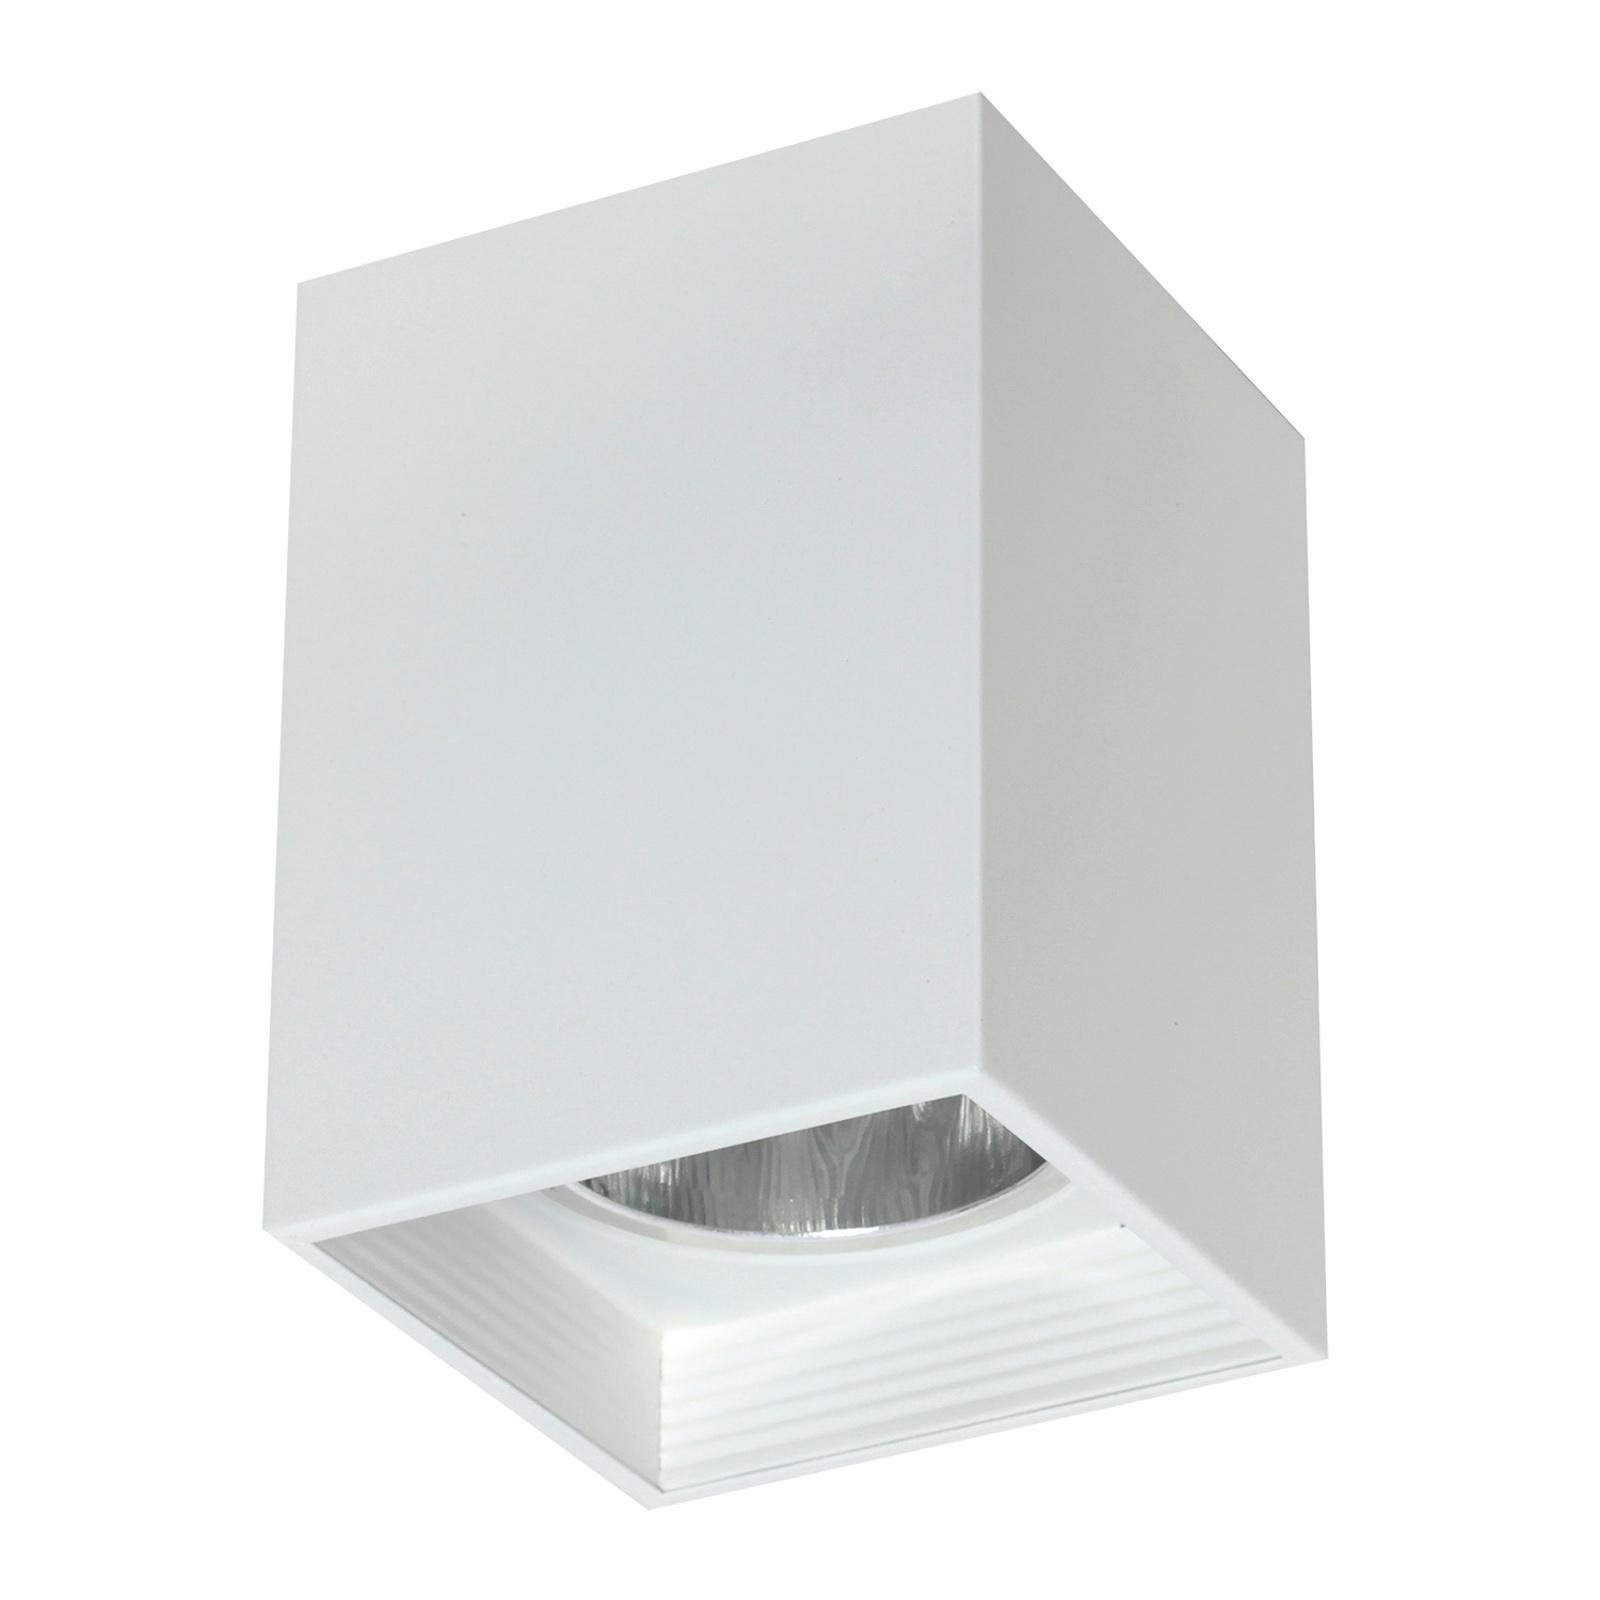 Kattolamppu Downlight square valkoinen, L 11,5 cm